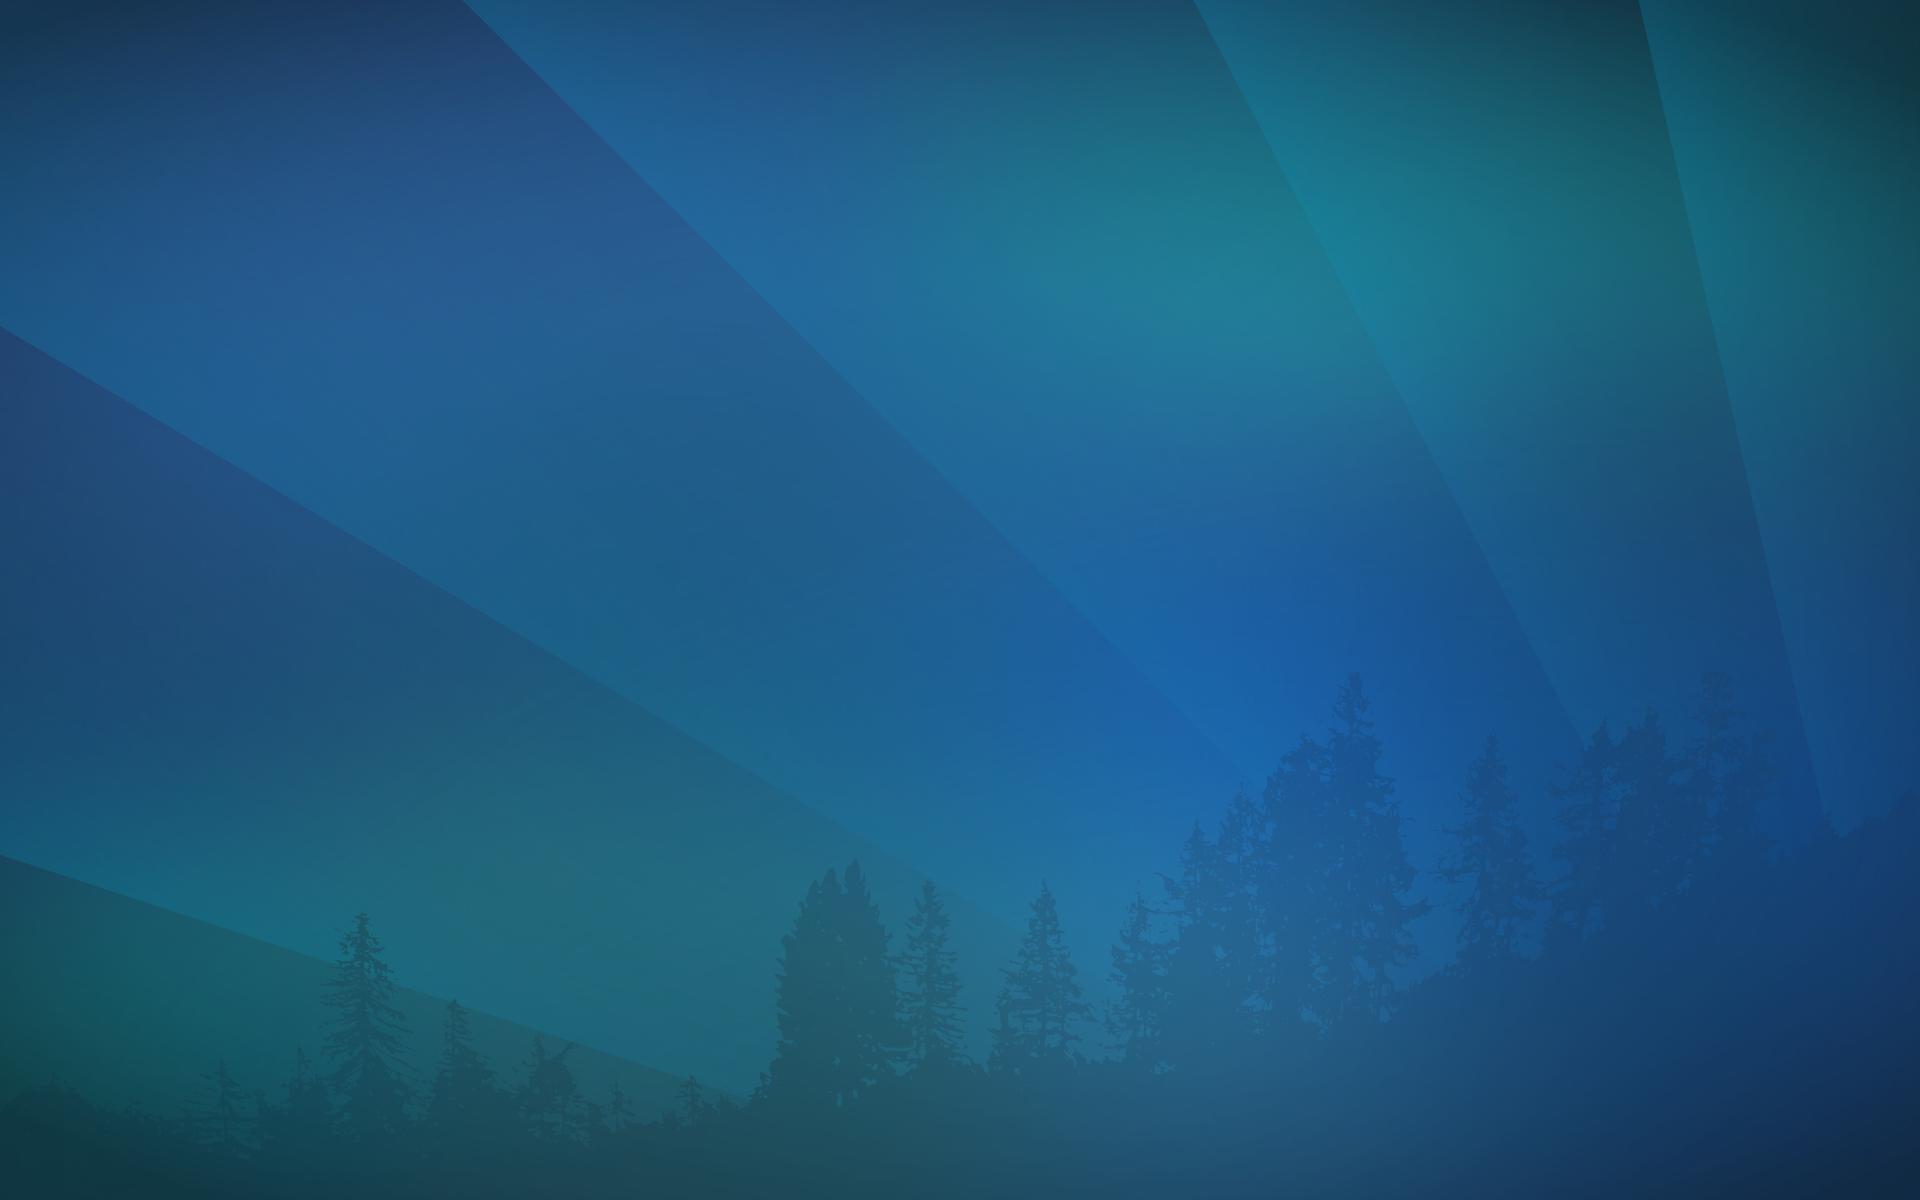 Linux Unix: Xubuntu 11 04 Default Wallpaper Announced